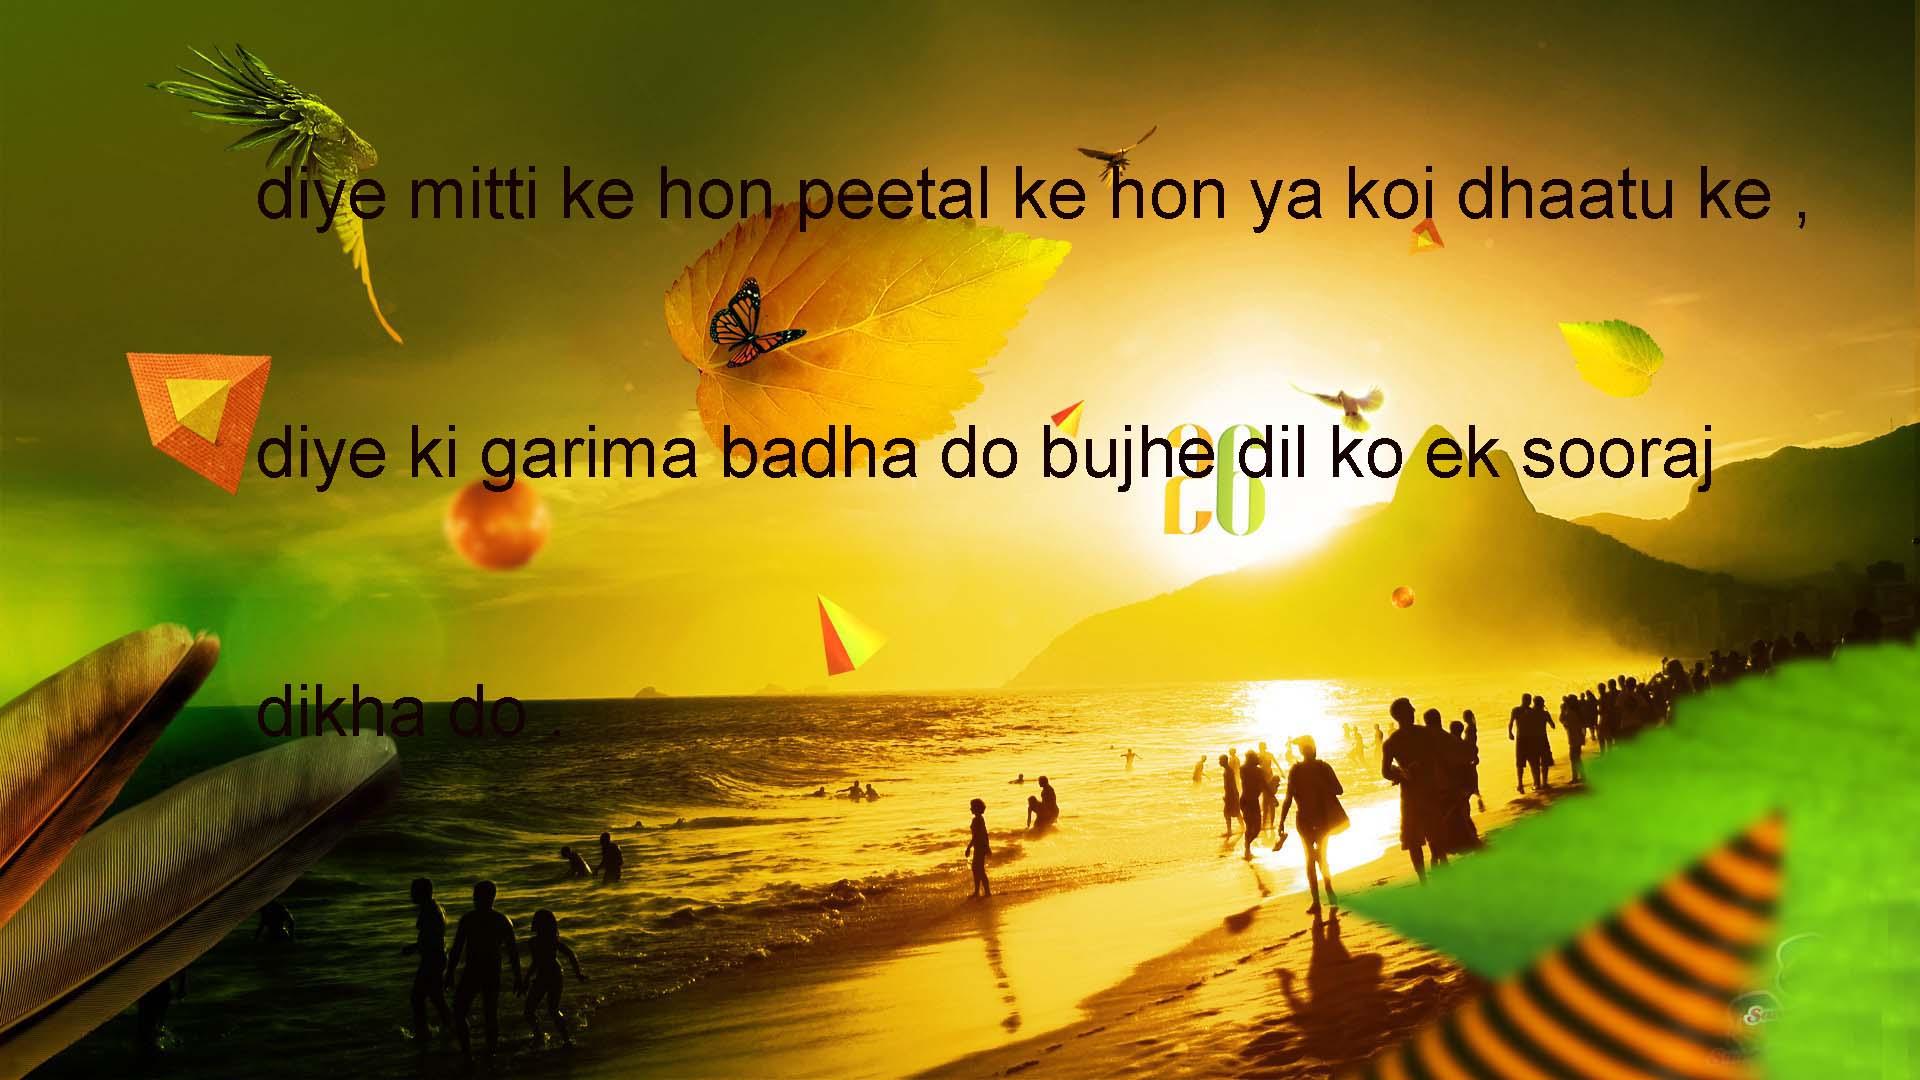 #desh bhakti hindi quotes,